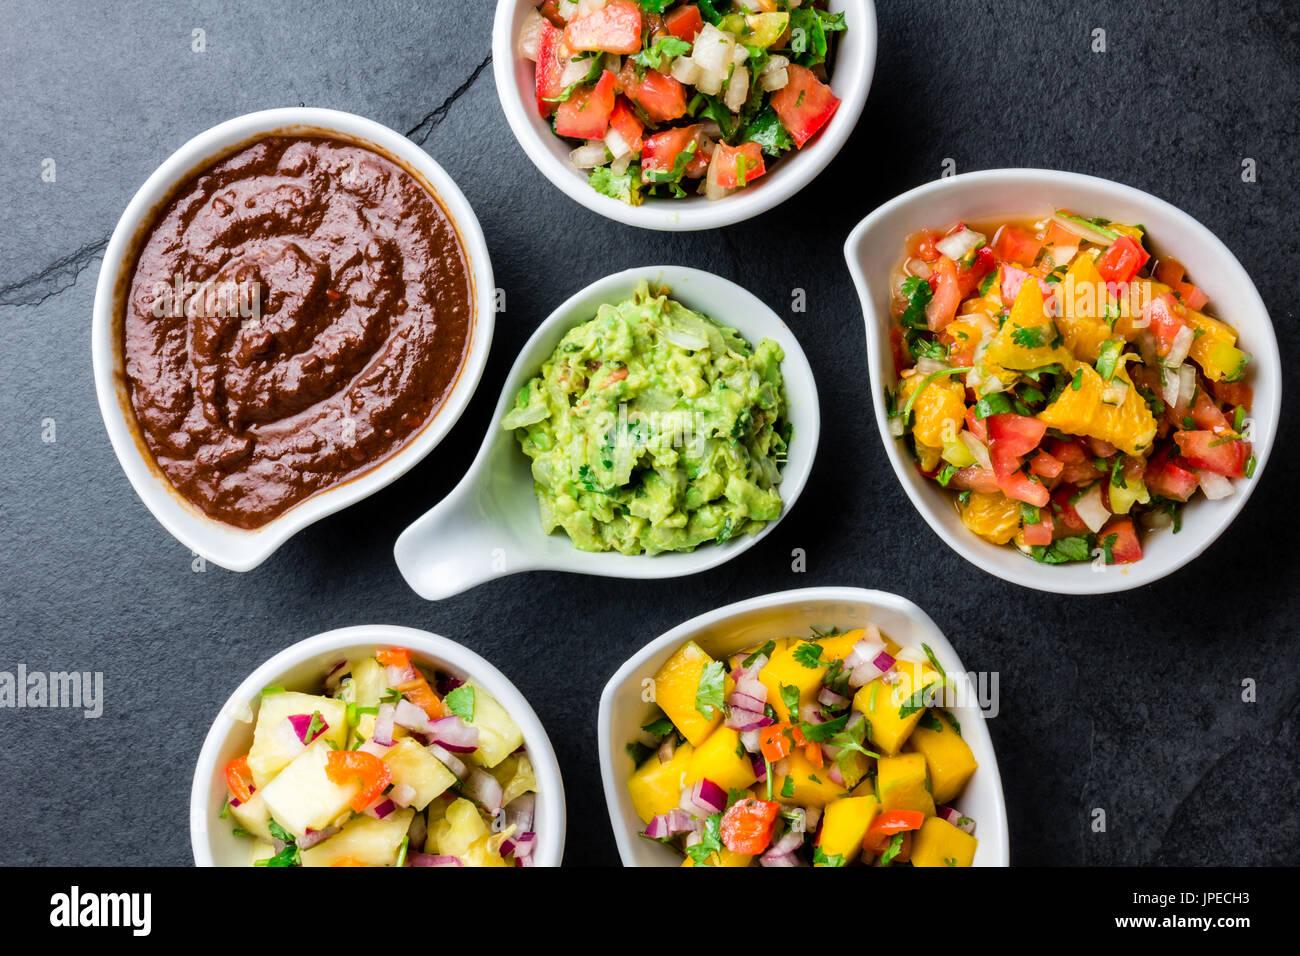 Traditional famous mexican sauces chocolate chili mole poblano, pico de gallo, avocado guacamole, salsa bandera, pinapple salsa, mango salsa on slate  Stock Photo